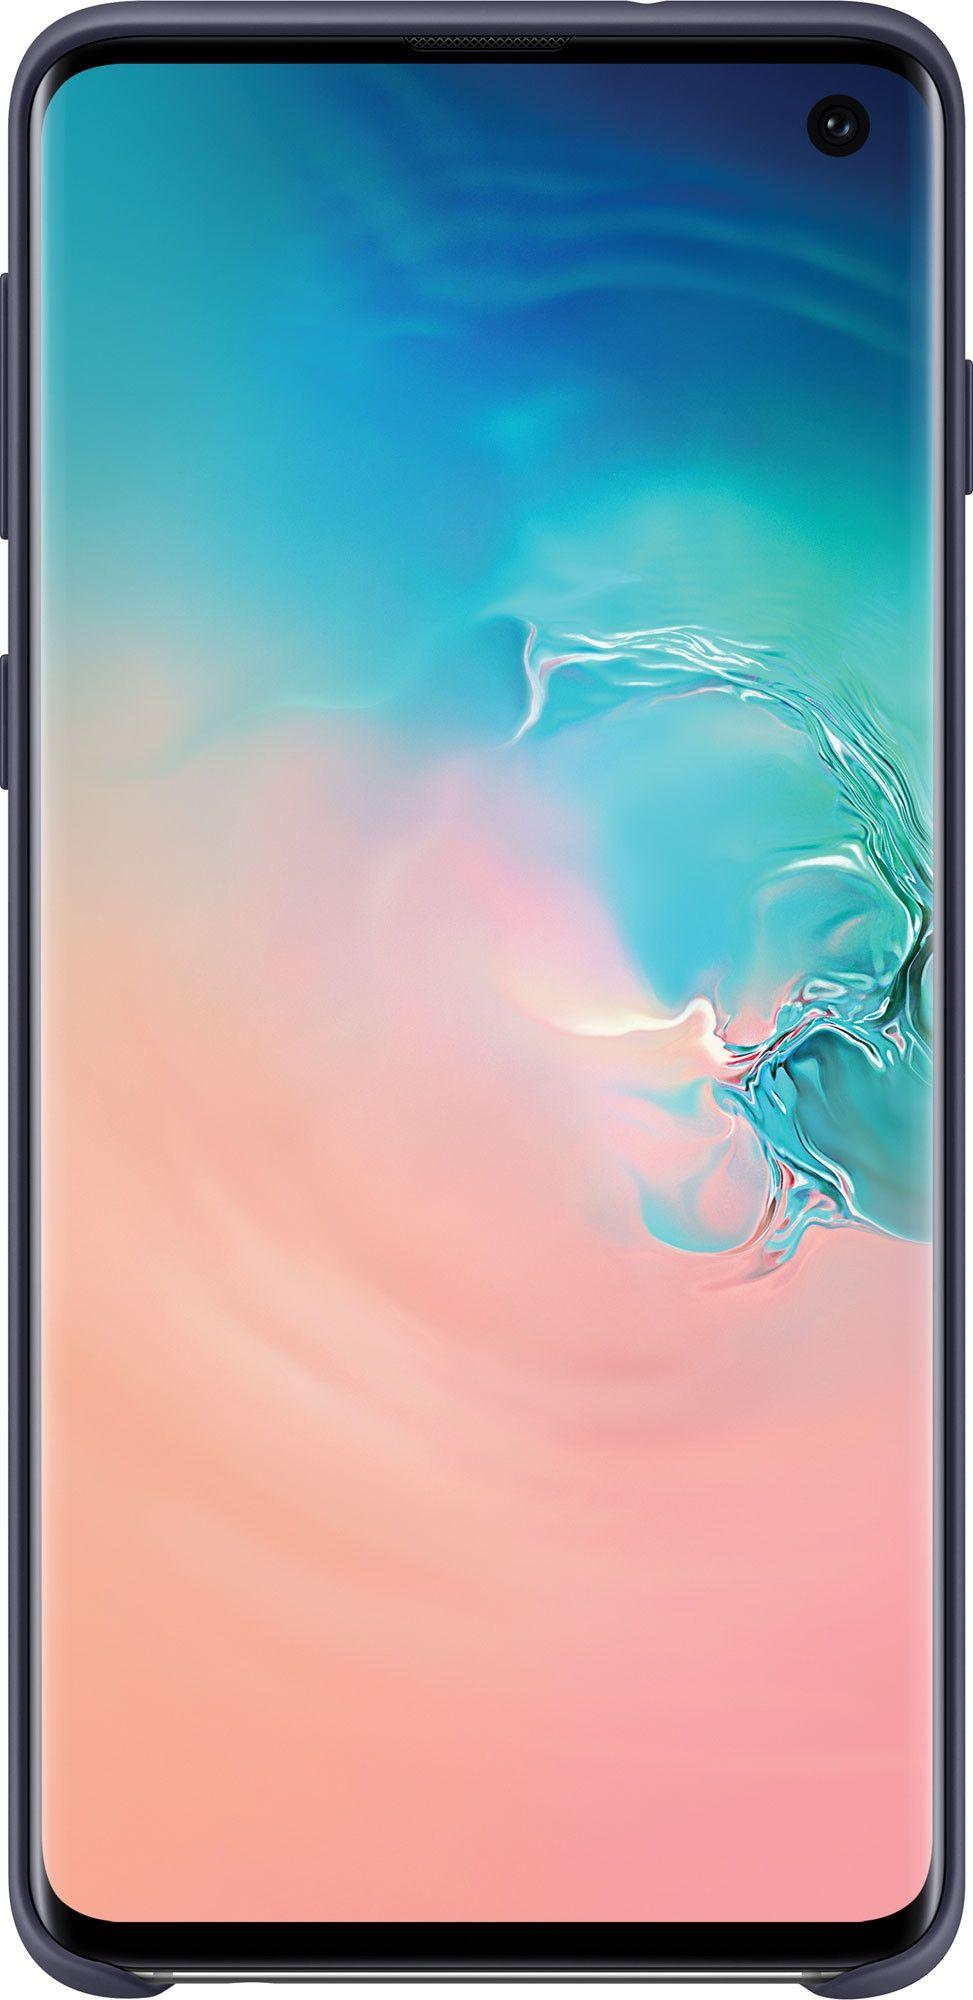 Панель Samsung Silicone Cover для Samsung Galaxy S10 (EF-PG973TNEGRU) Navy от Територія твоєї техніки - 2